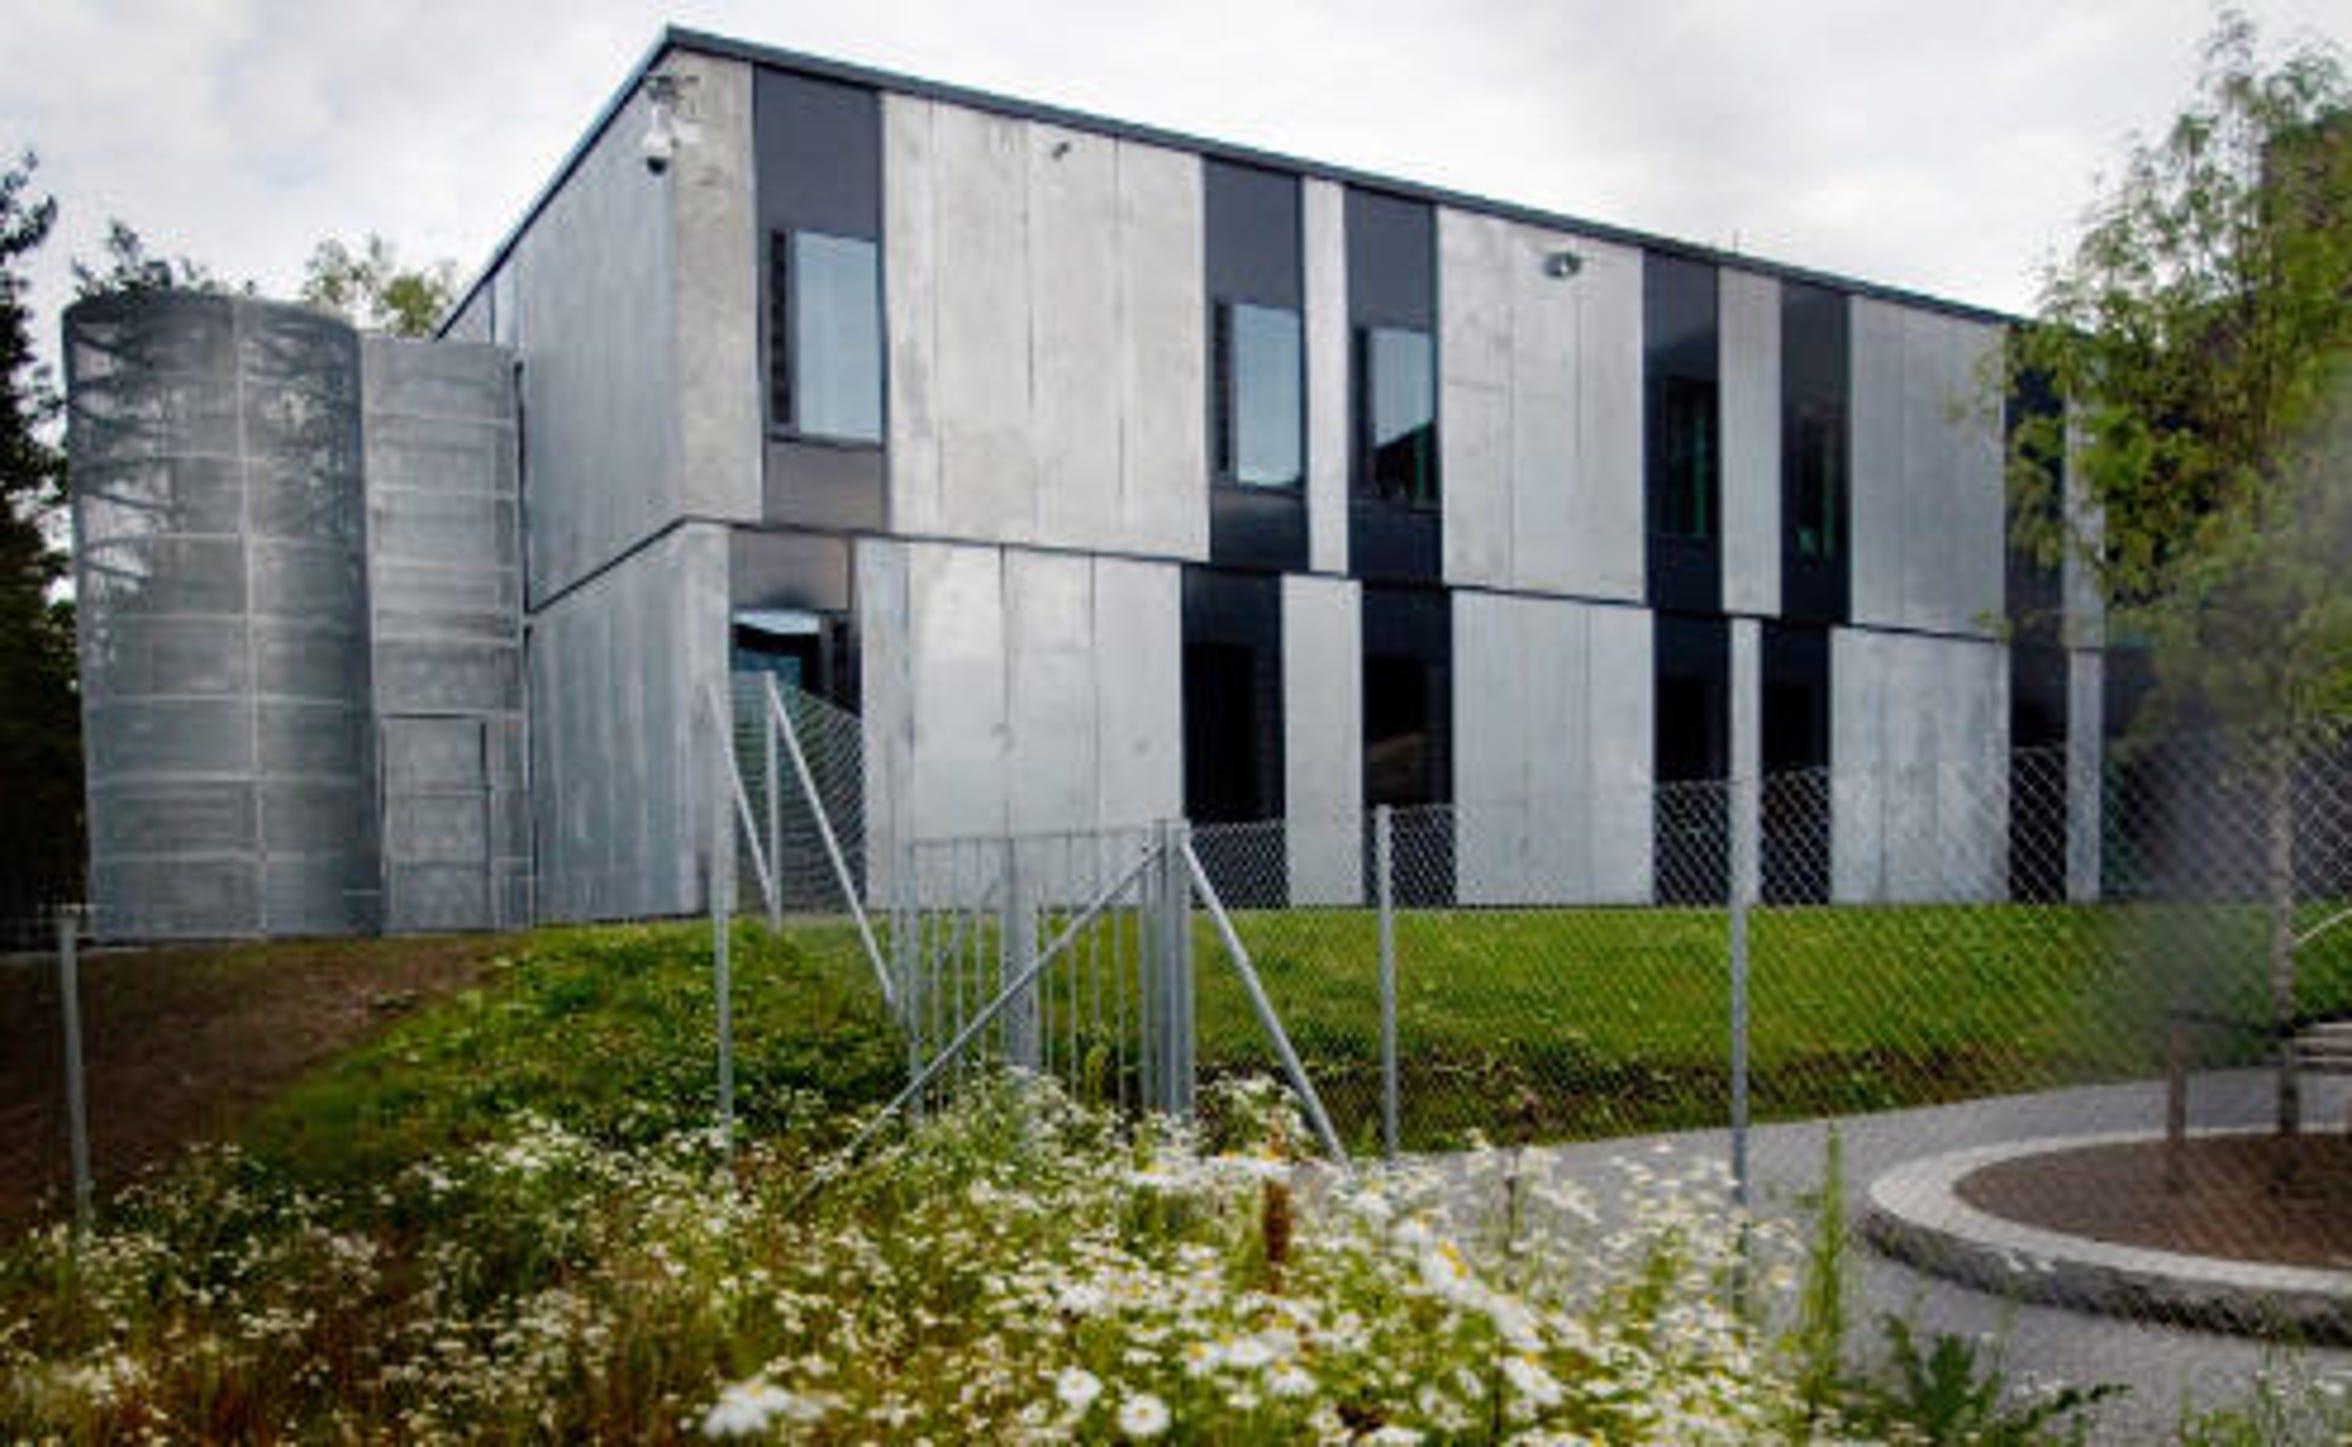 The exterior of Halden Prison.